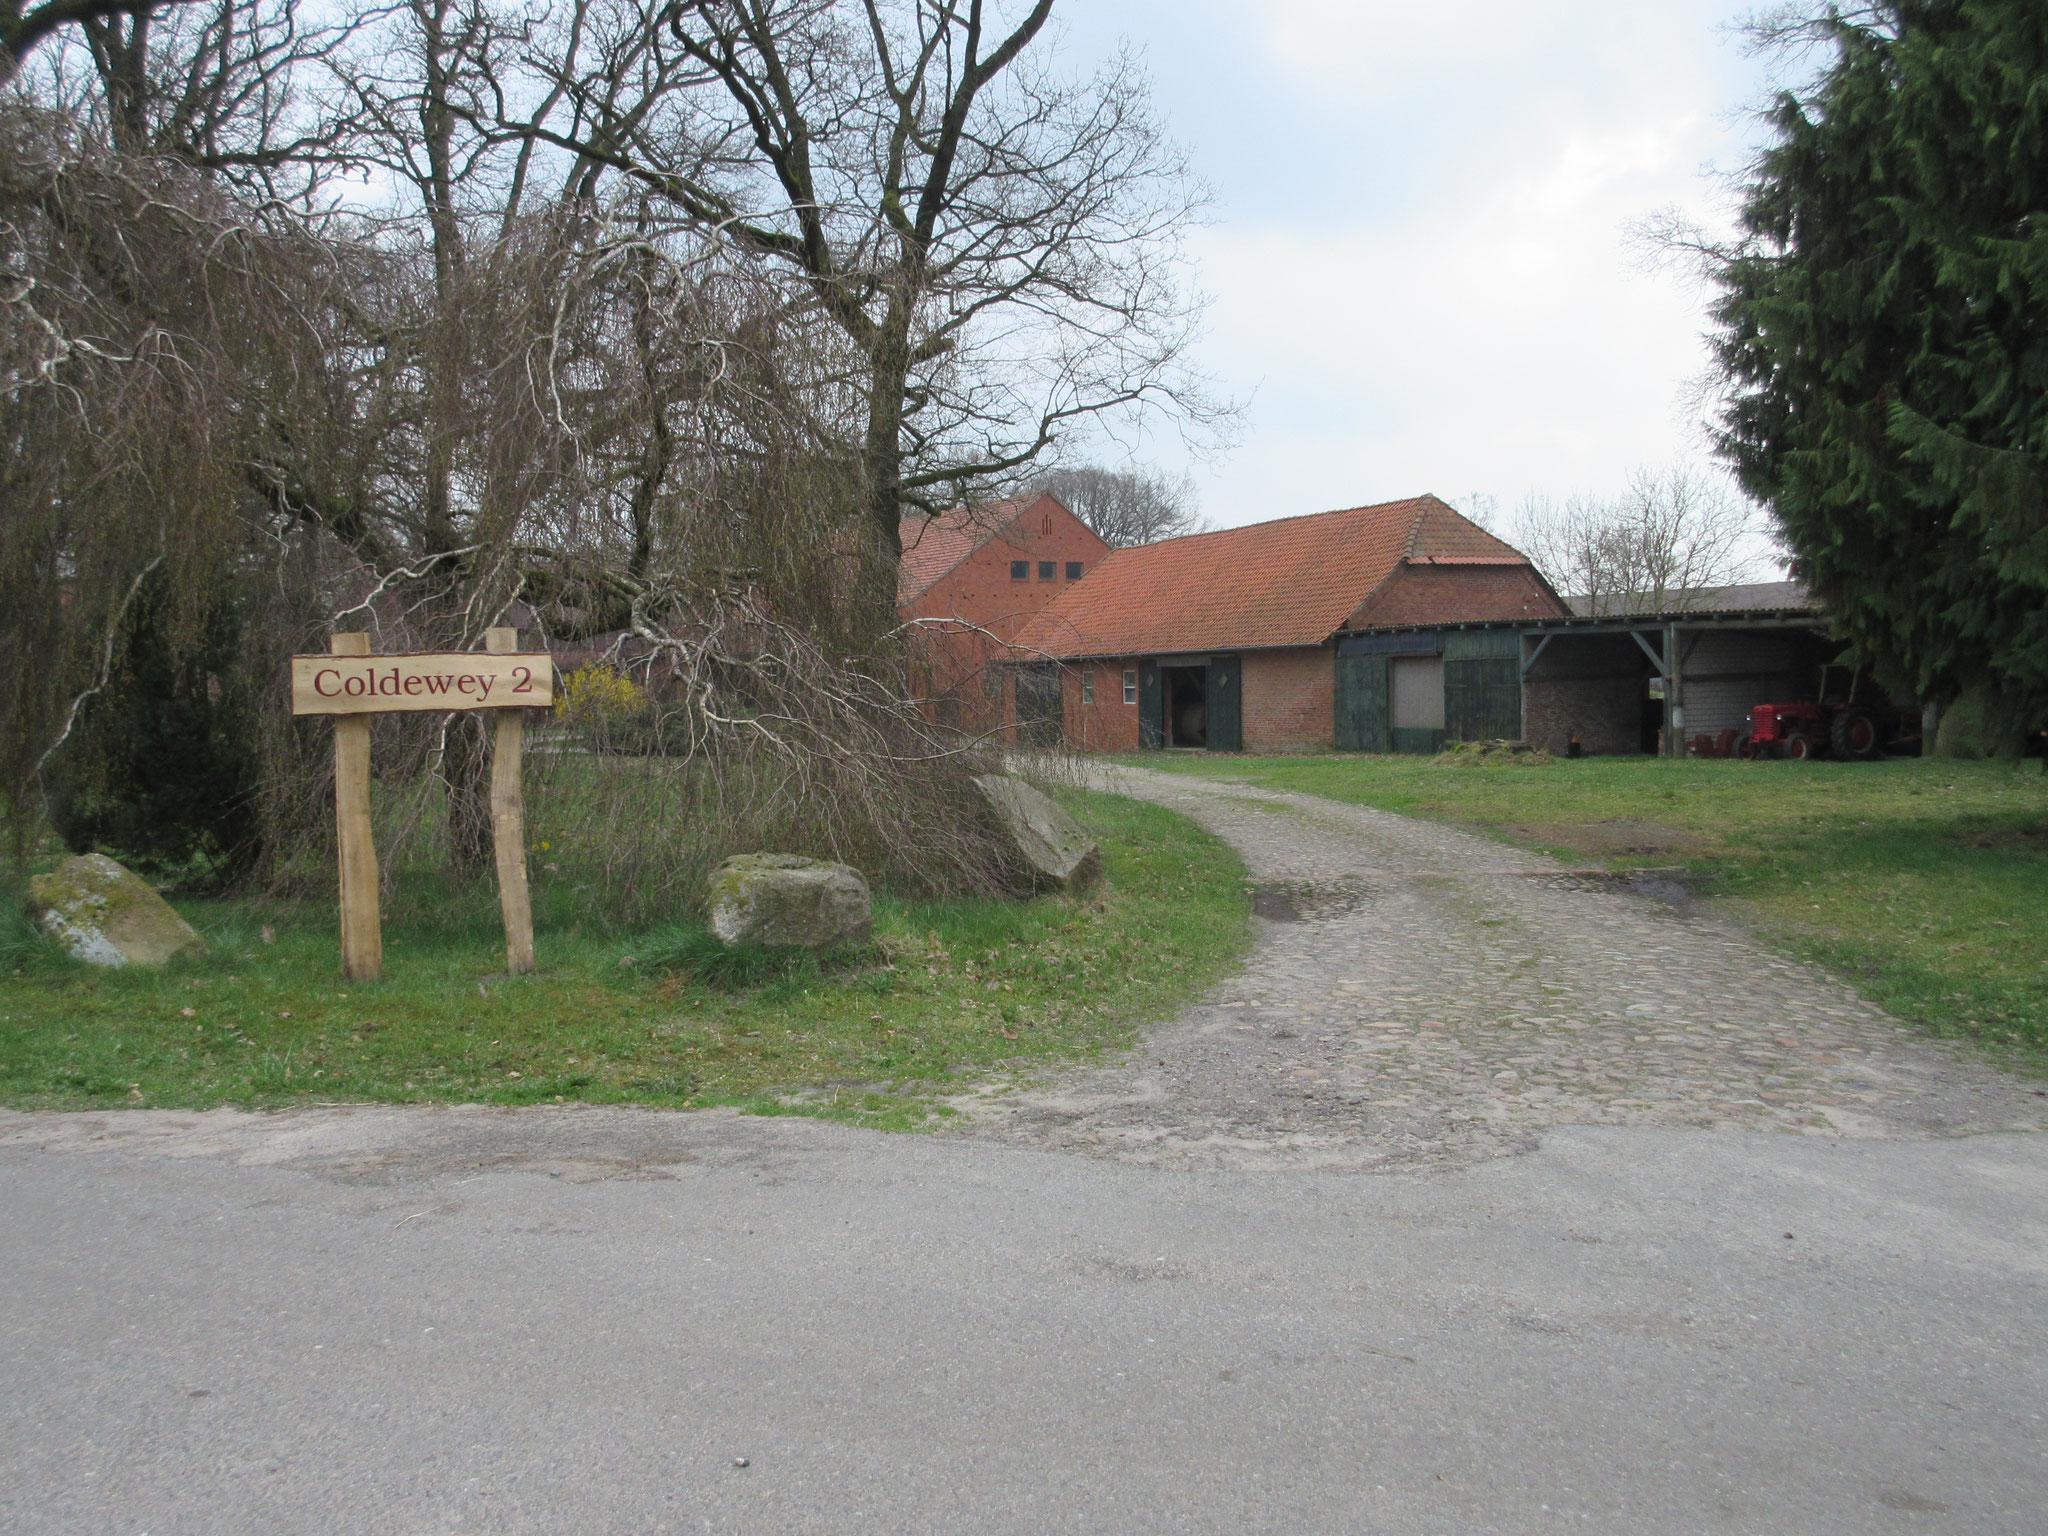 Hofeinfahrt Reiterhof Coldewey 2